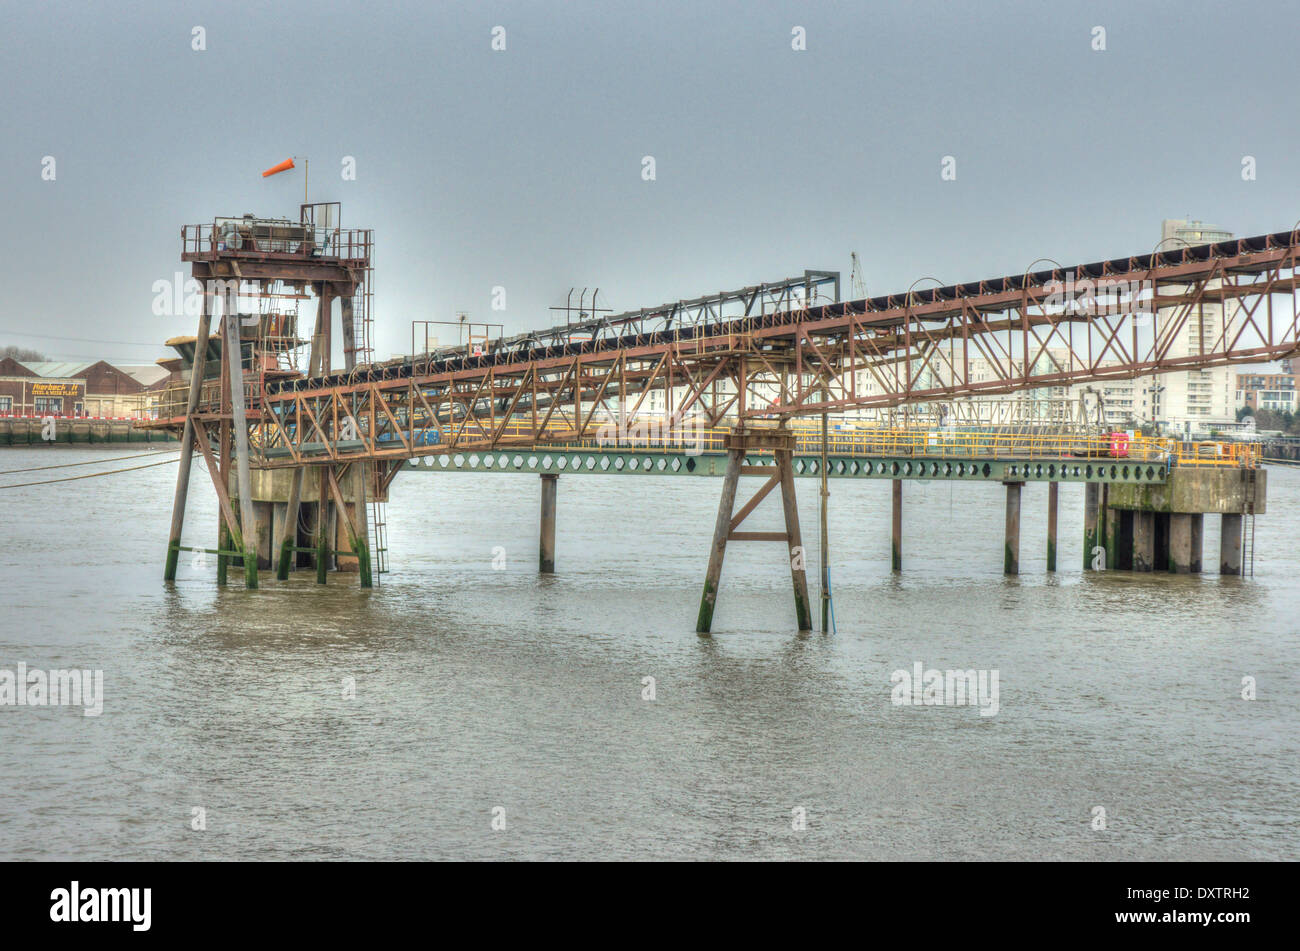 industrial conveyor belt on river Thames, London. - Stock Image